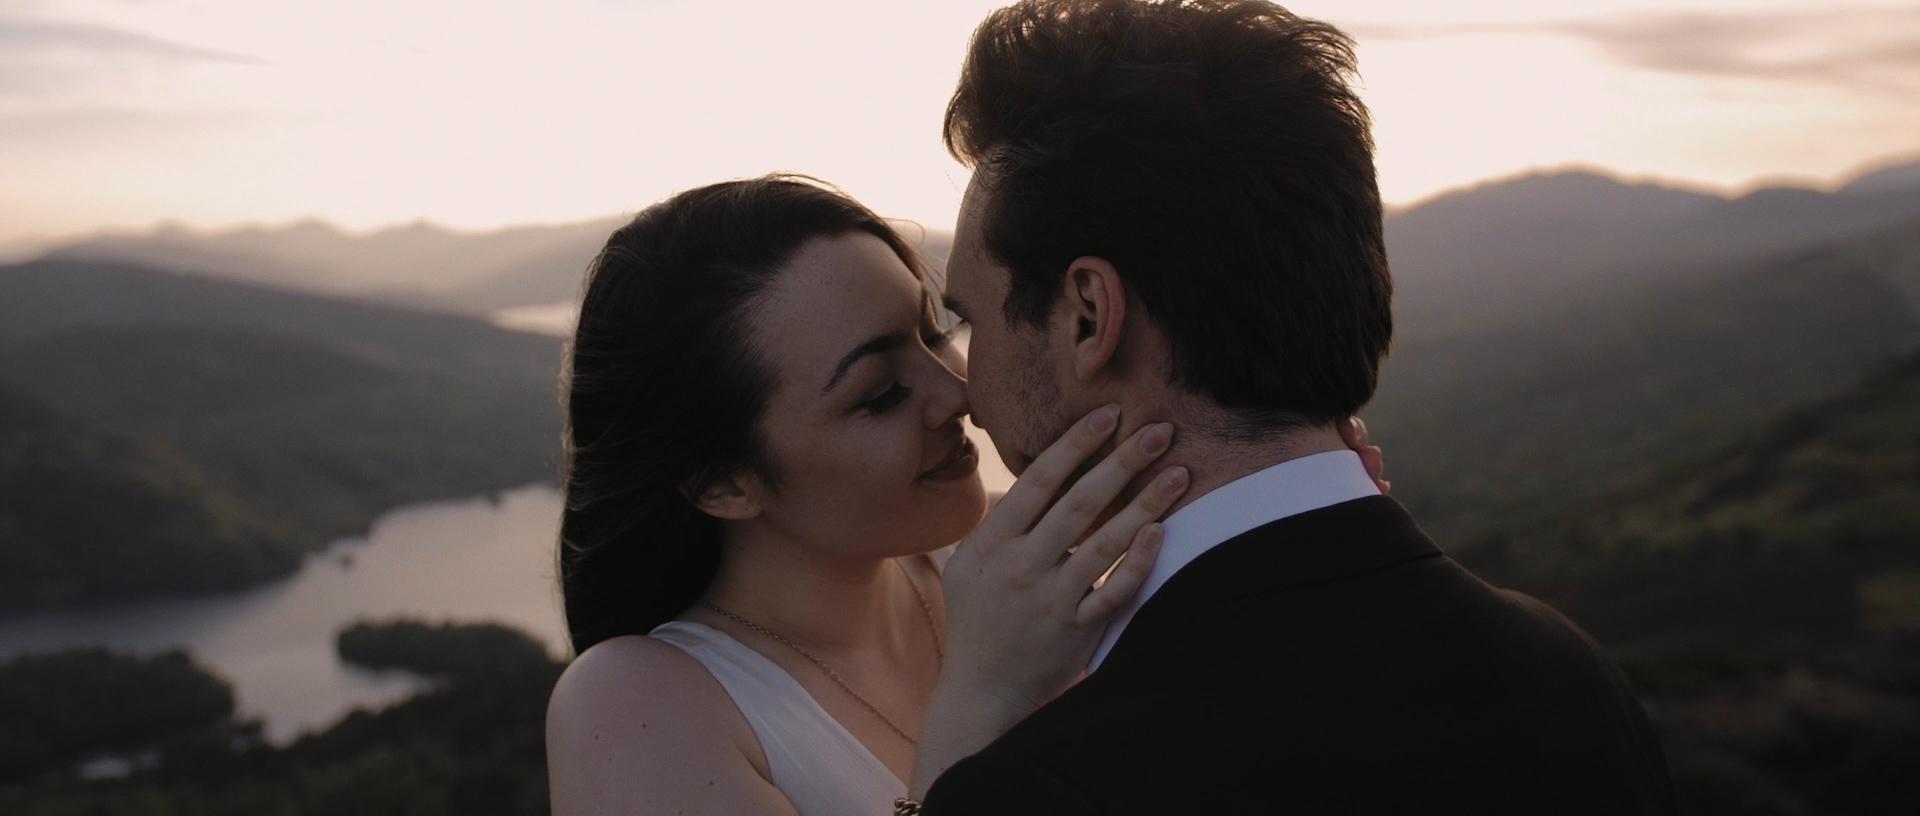 the-engine-works-wedding-videographer_LL_09.jpg